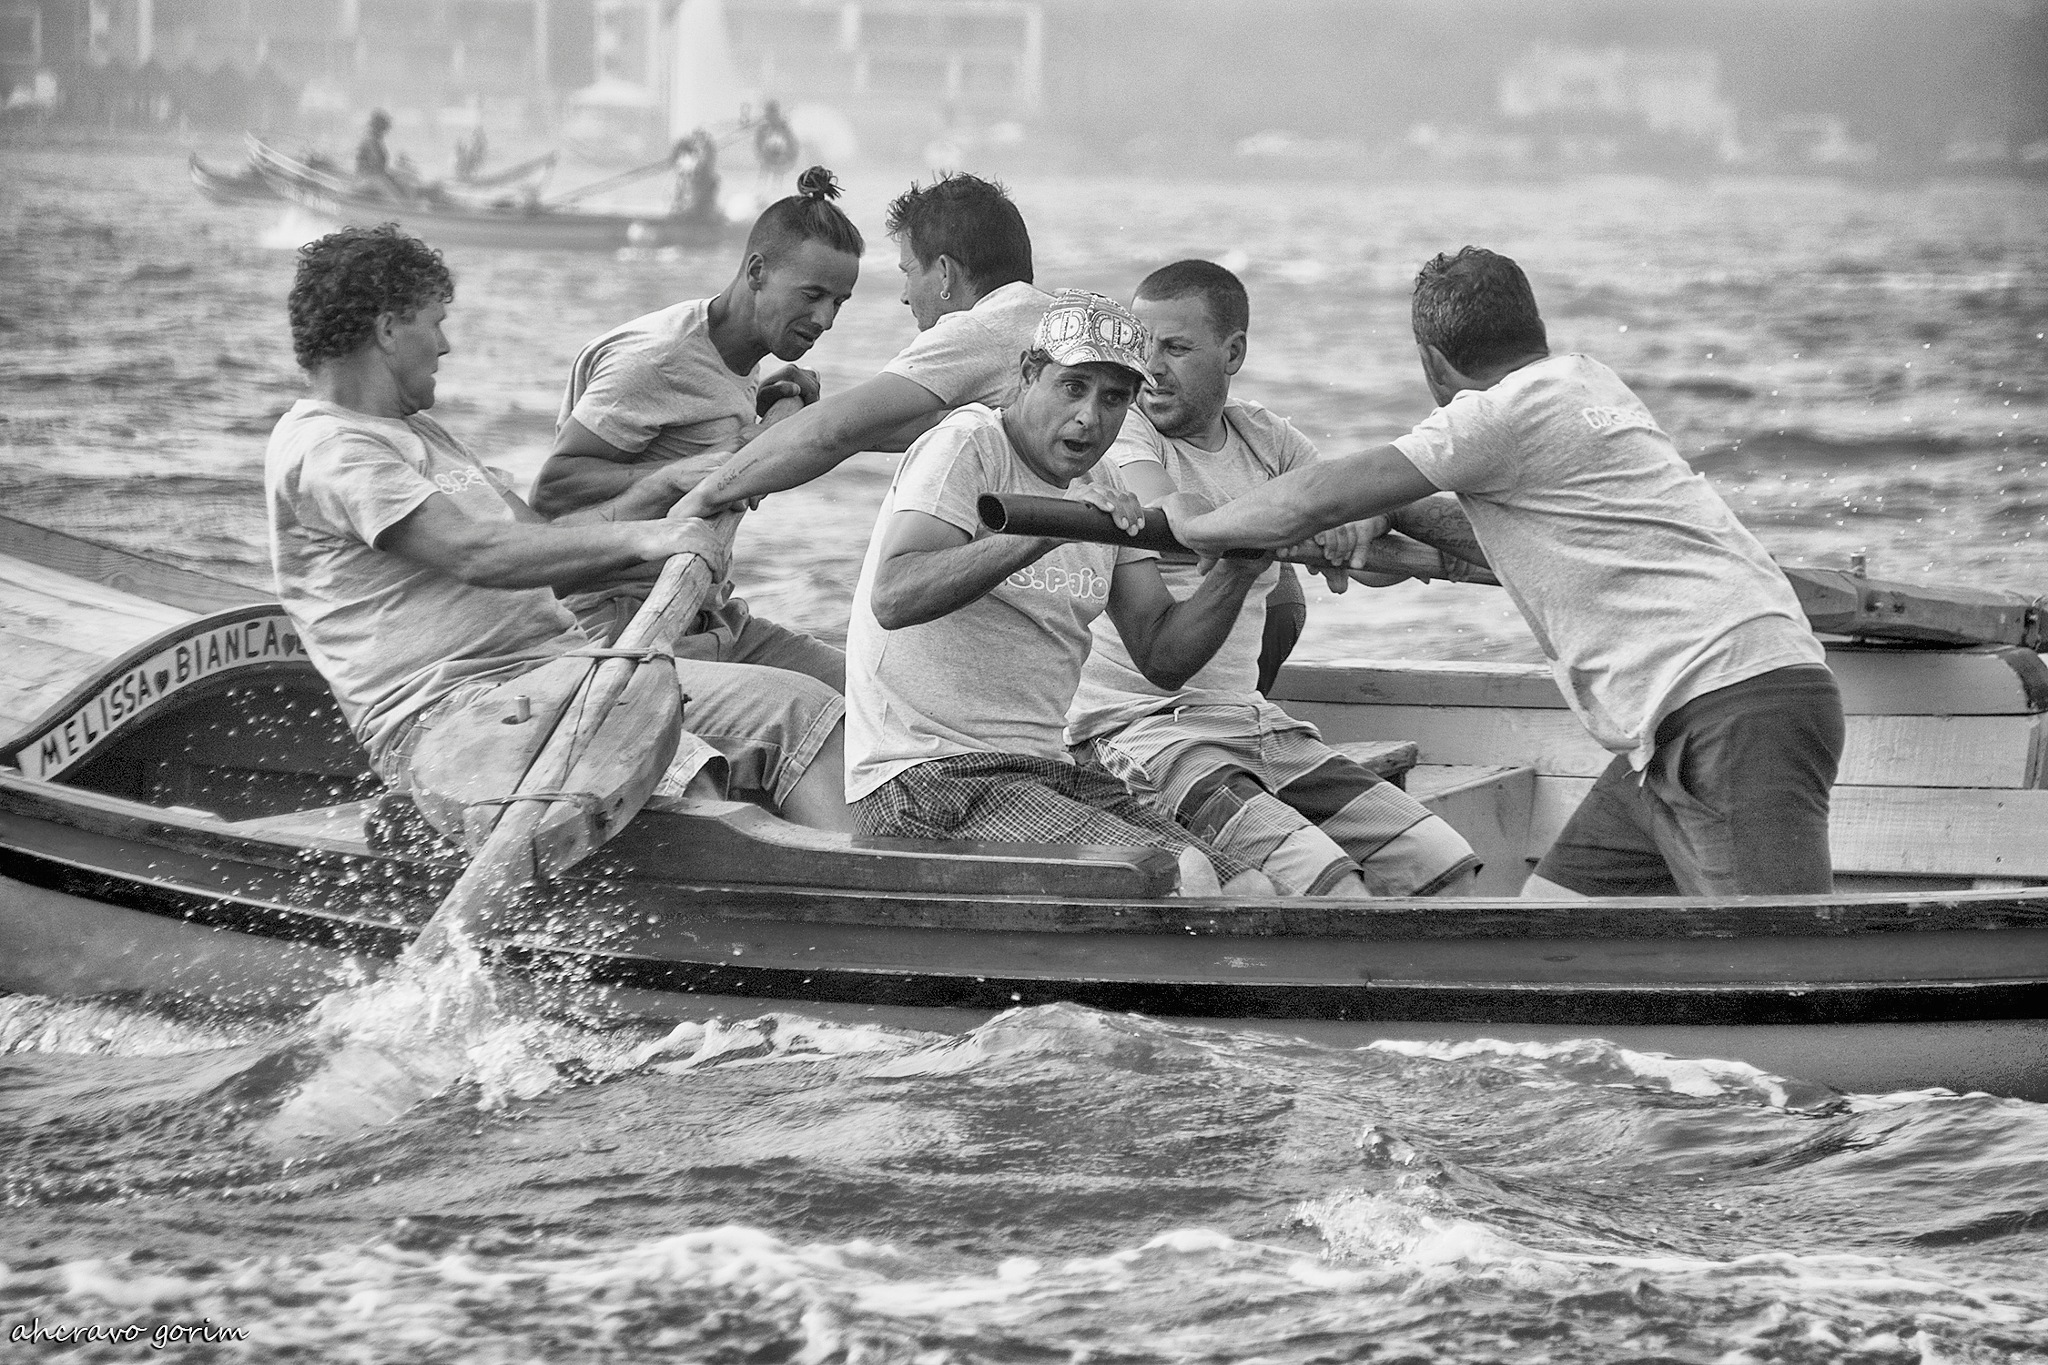 """chinchorros"" rowing race (2016) by ahcravo gorim"